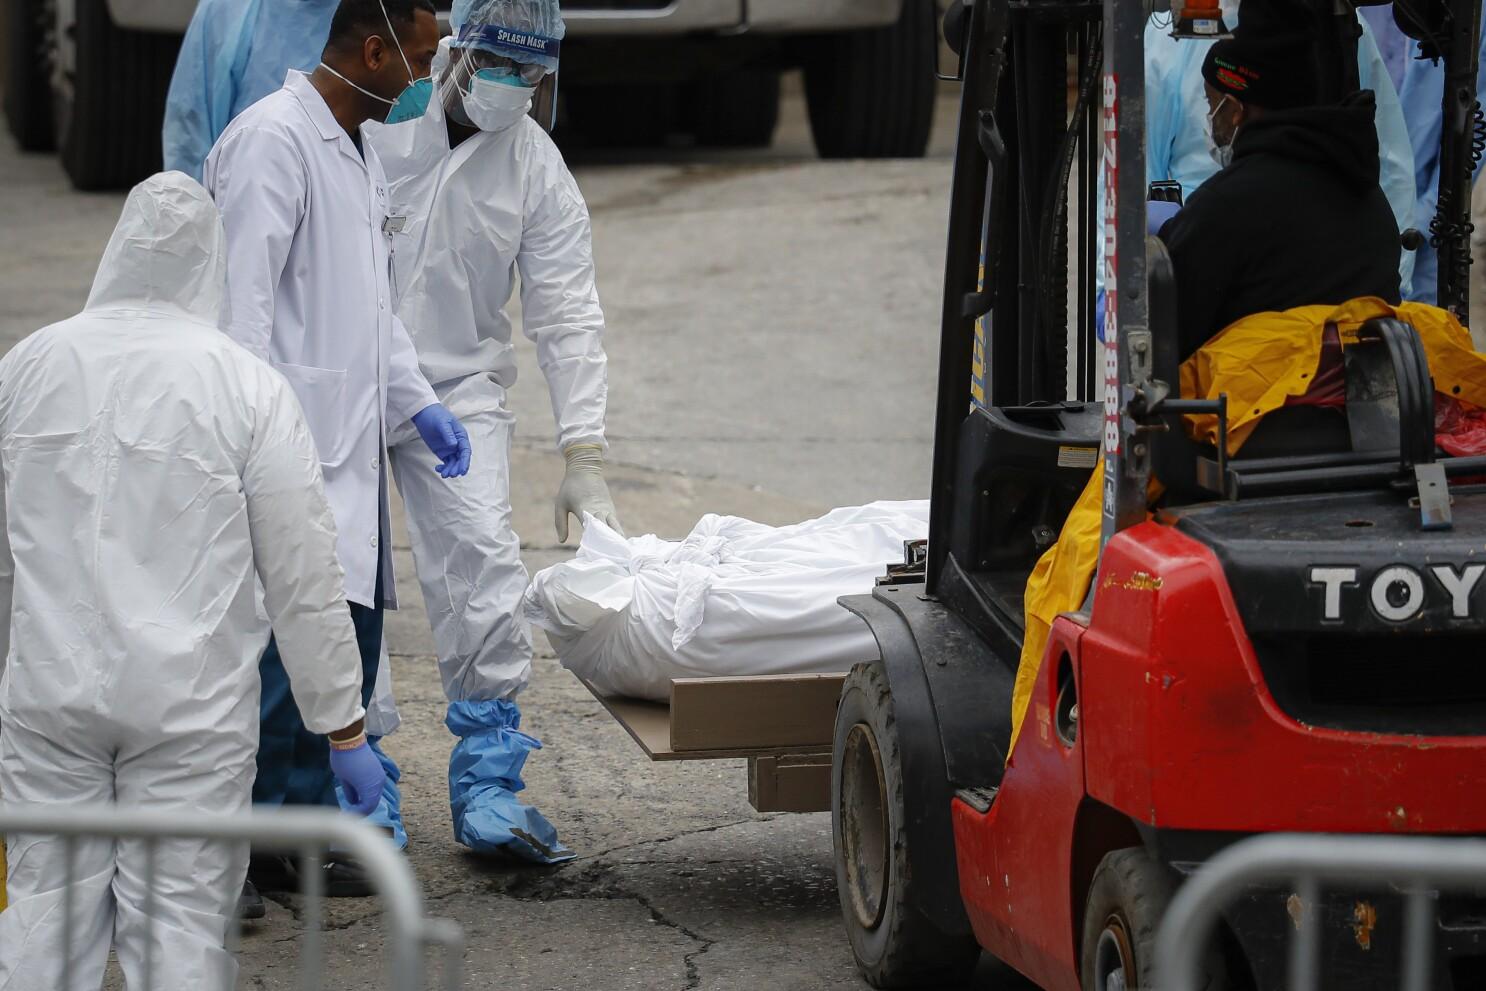 Muertos por coronavirus rebasan a hospitales en NY - San Diego  Union-Tribune en Español